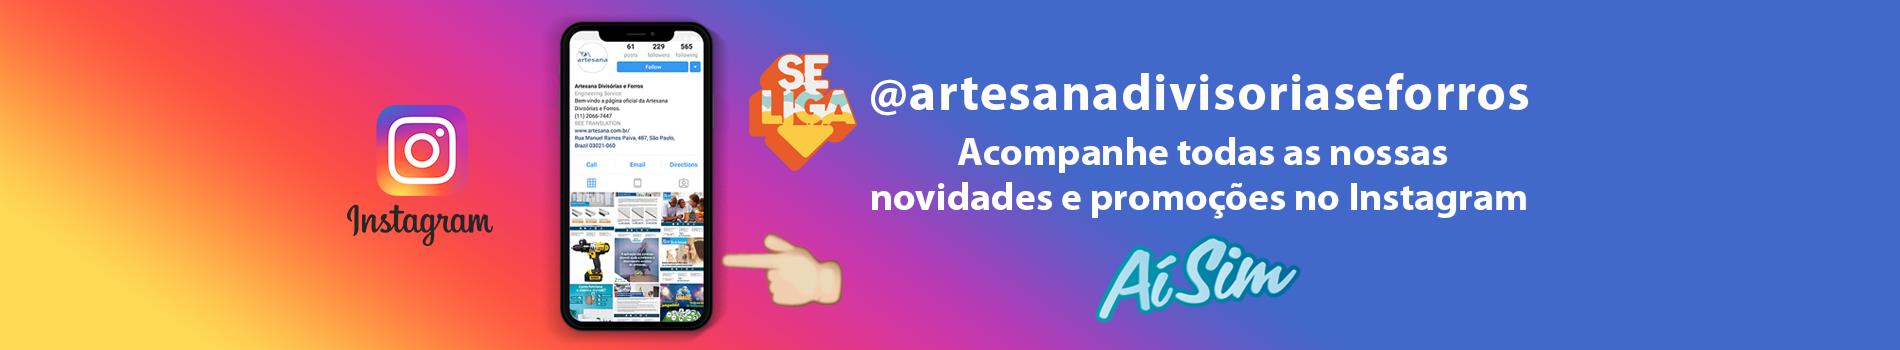 https://www.instagram.com/artesanadivisoriaseforros/